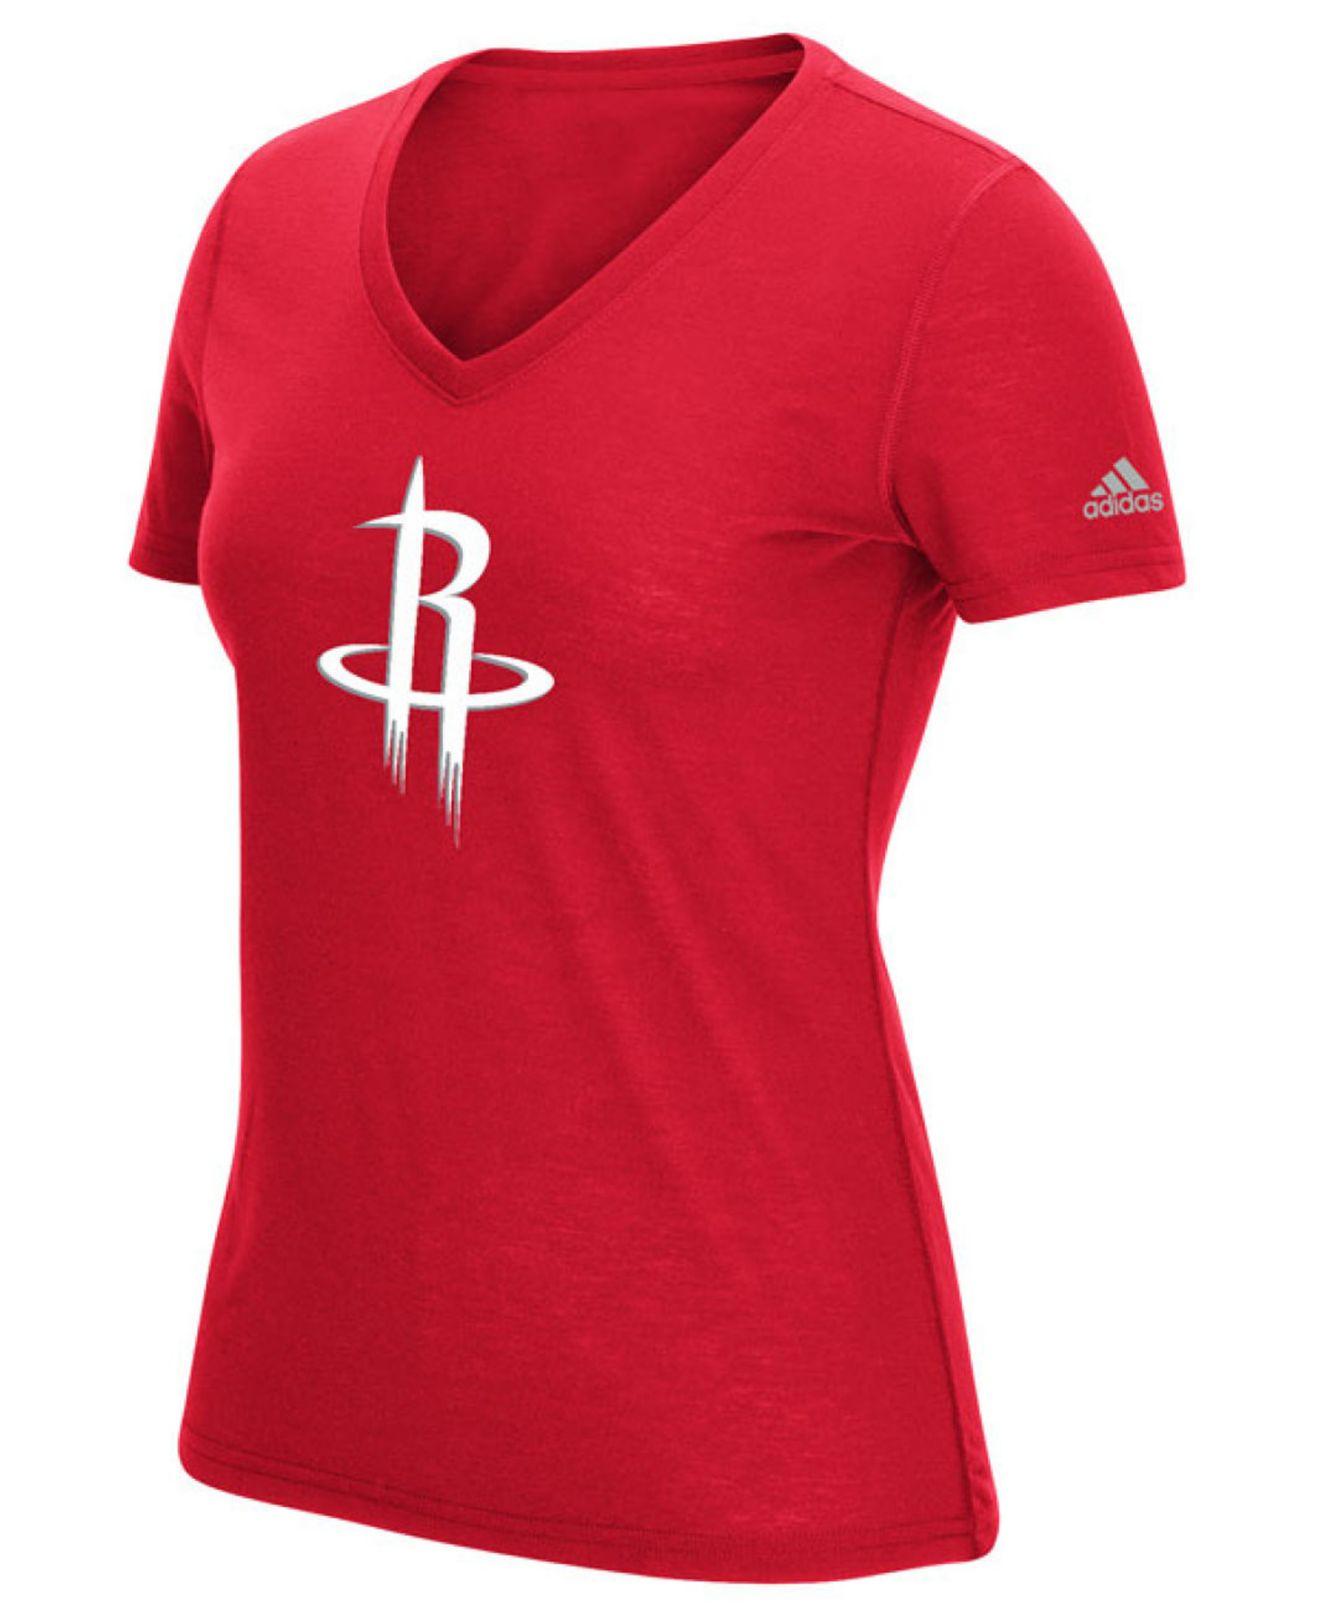 Houston Rockets Warm Up Shirt: Adidas Women's Houston Rockets Climalite T-shirt In Red